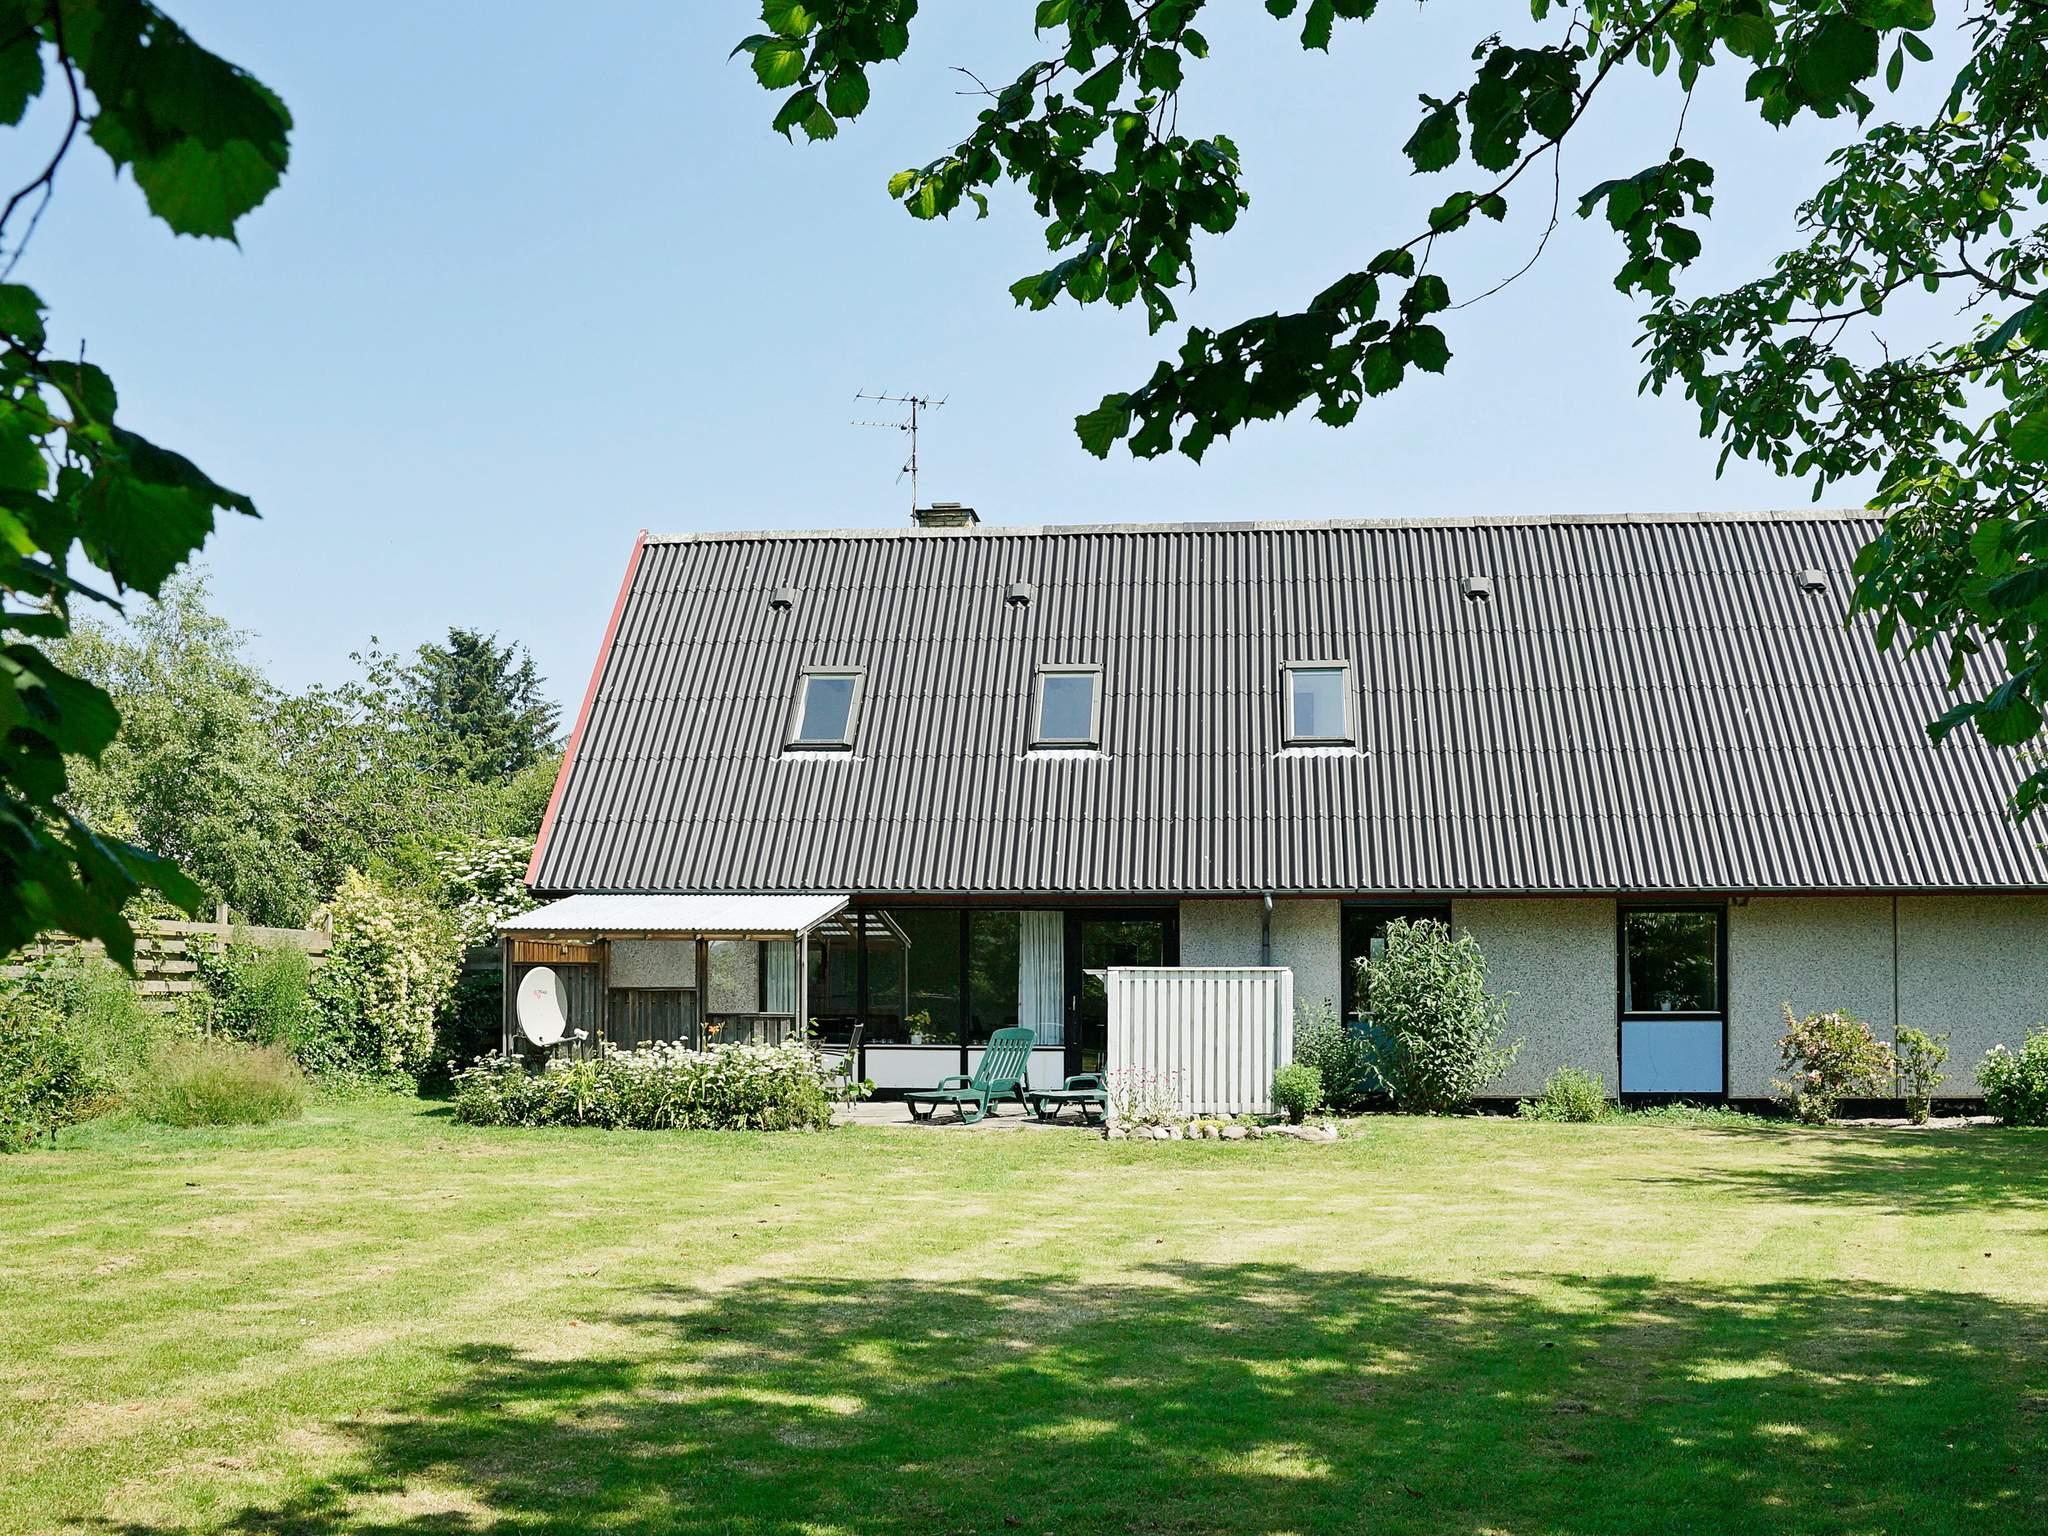 Ferienhaus Balka Strand (921368), Balke, , Bornholm, Dänemark, Bild 19